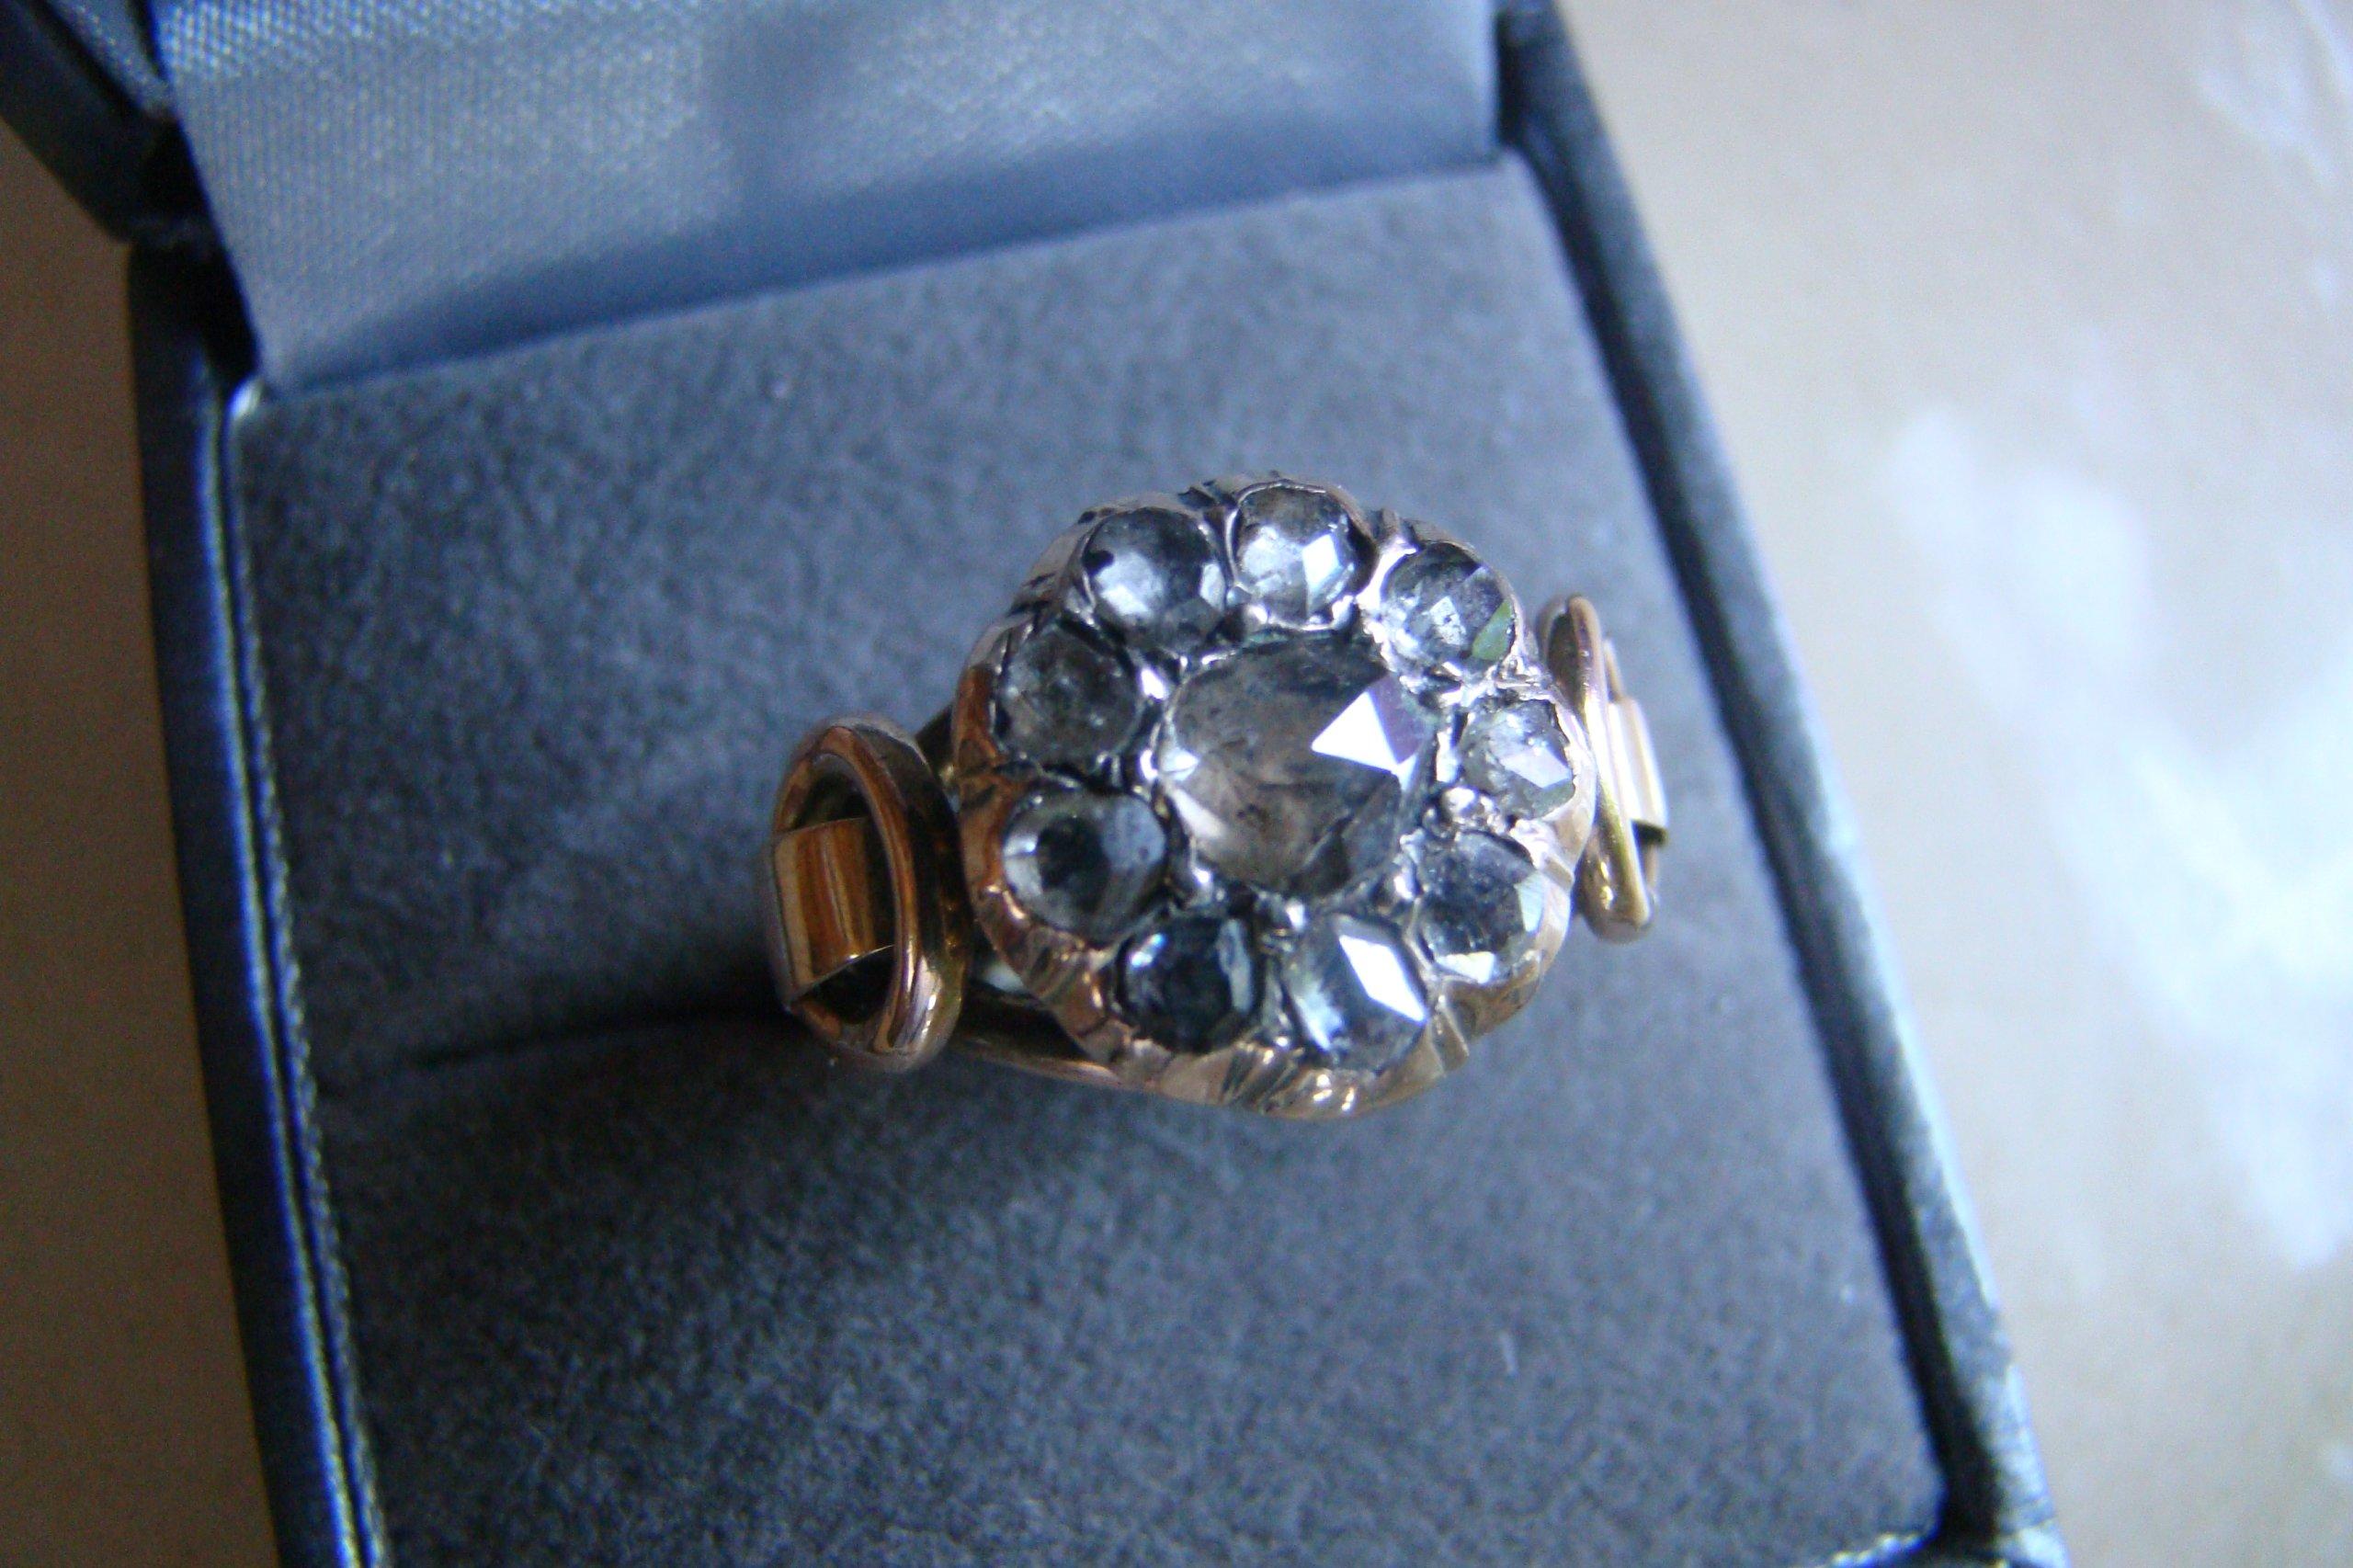 0a7c8e3e4db8e4 Stary, złoty pierścionek z diamentami - 7447120648 - oficjalne ...